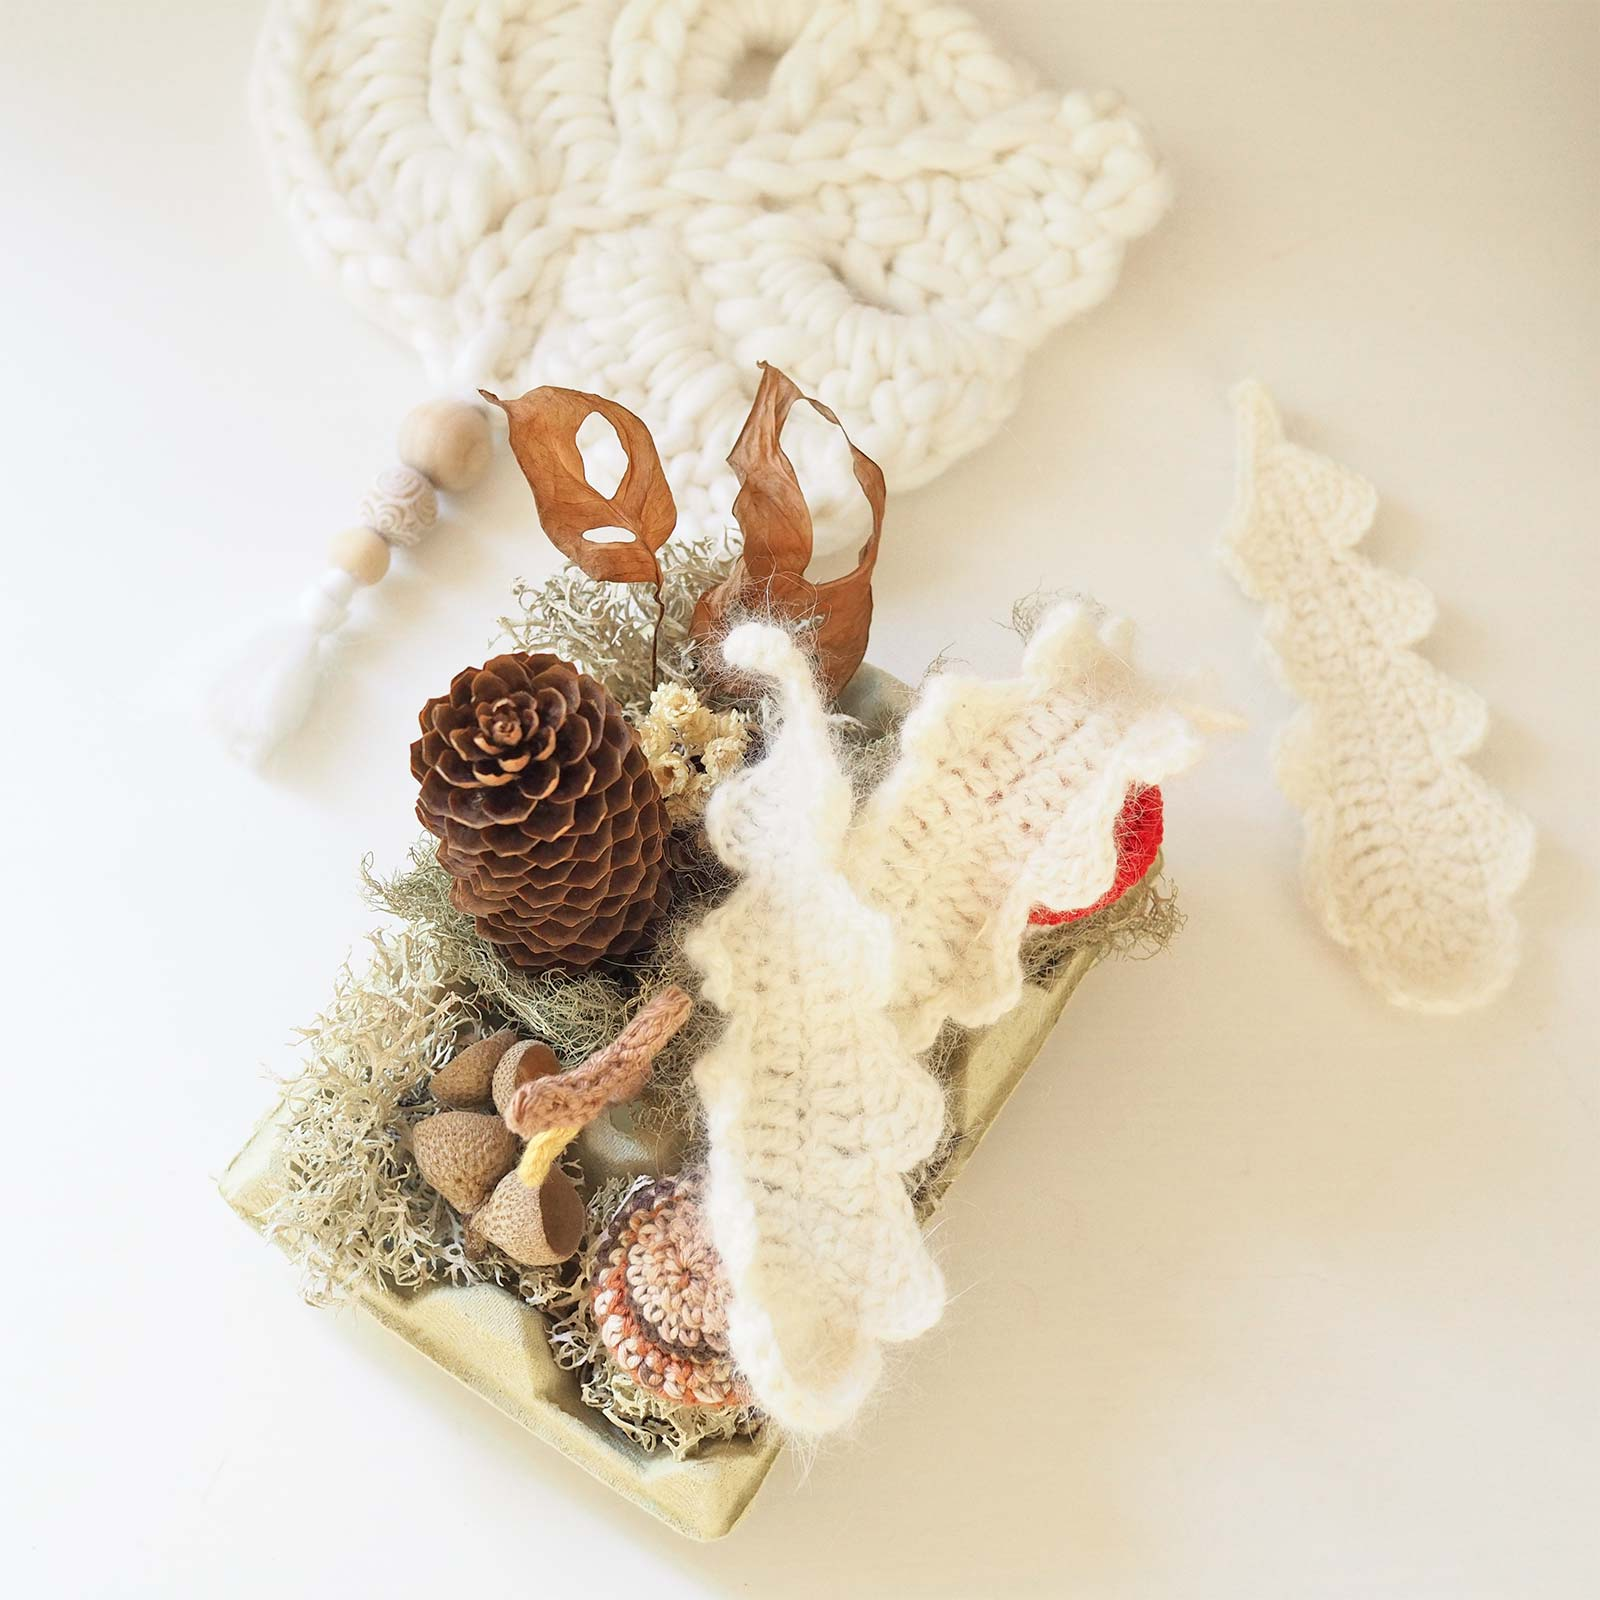 diy-boite-oeufs-inspiration-crochet-automne-laboutiquedemelimelo